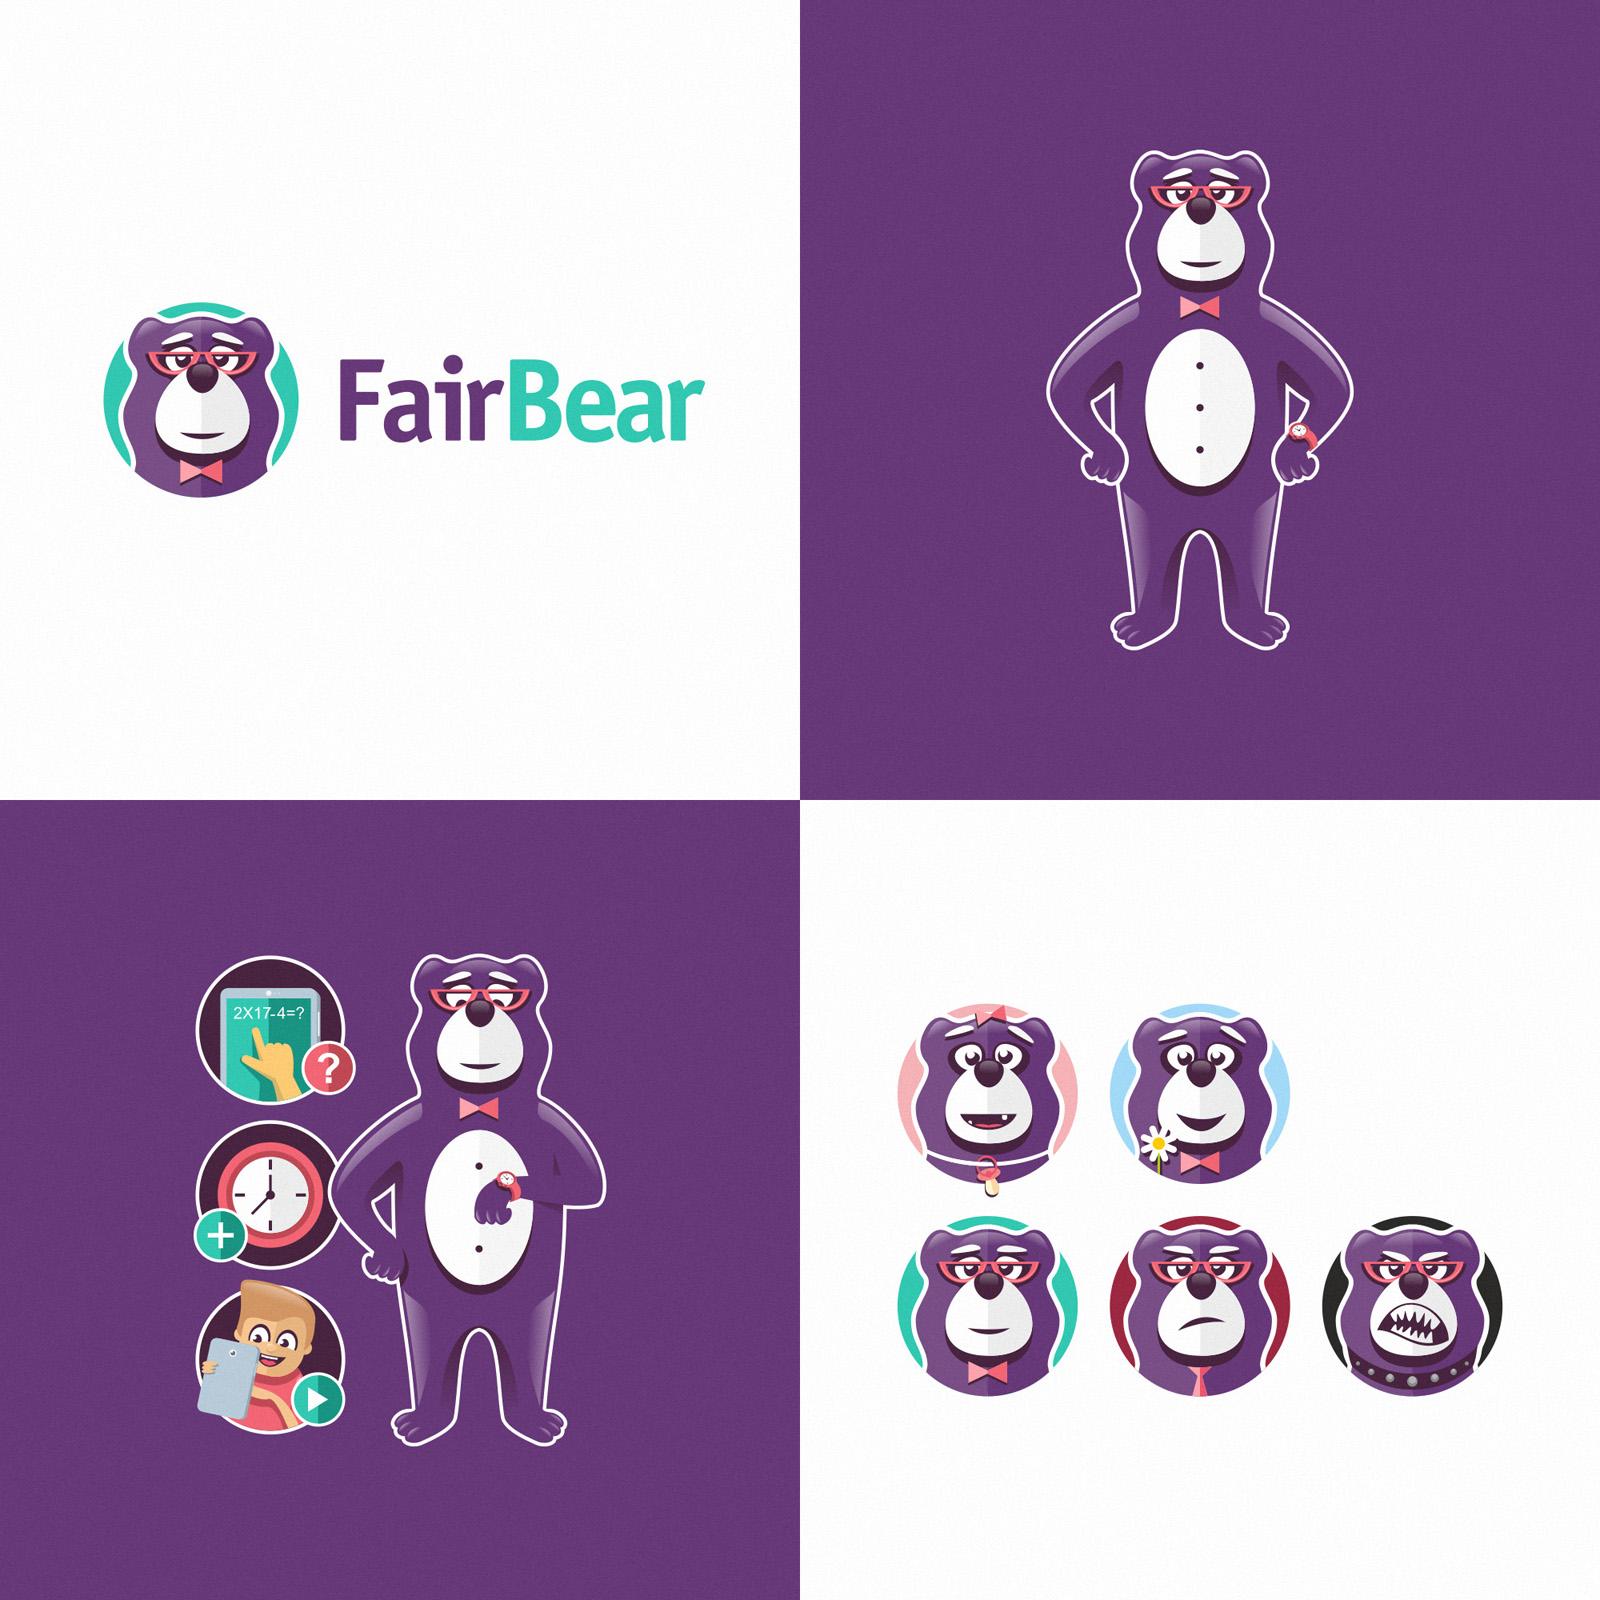 FairBear